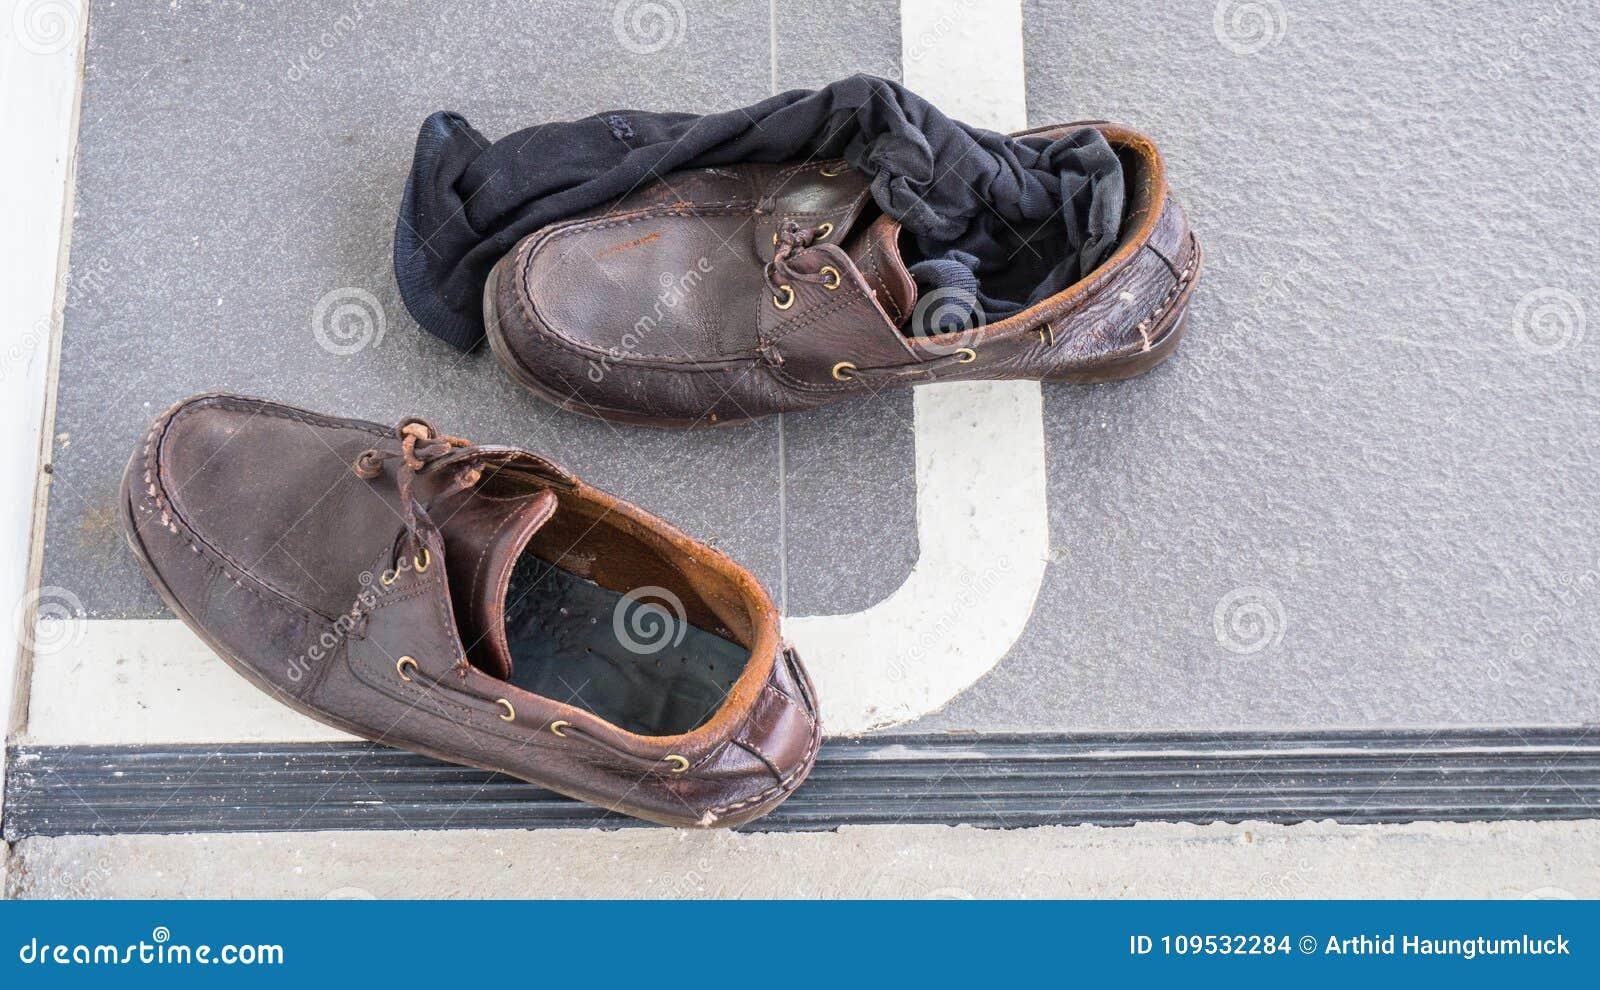 f338fd84a04 Download Βρώμικα παπούτσια και μαύρες κάλτσες στο πάτωμα στο γραφείο Στοκ  Εικόνες - εικόνα από και